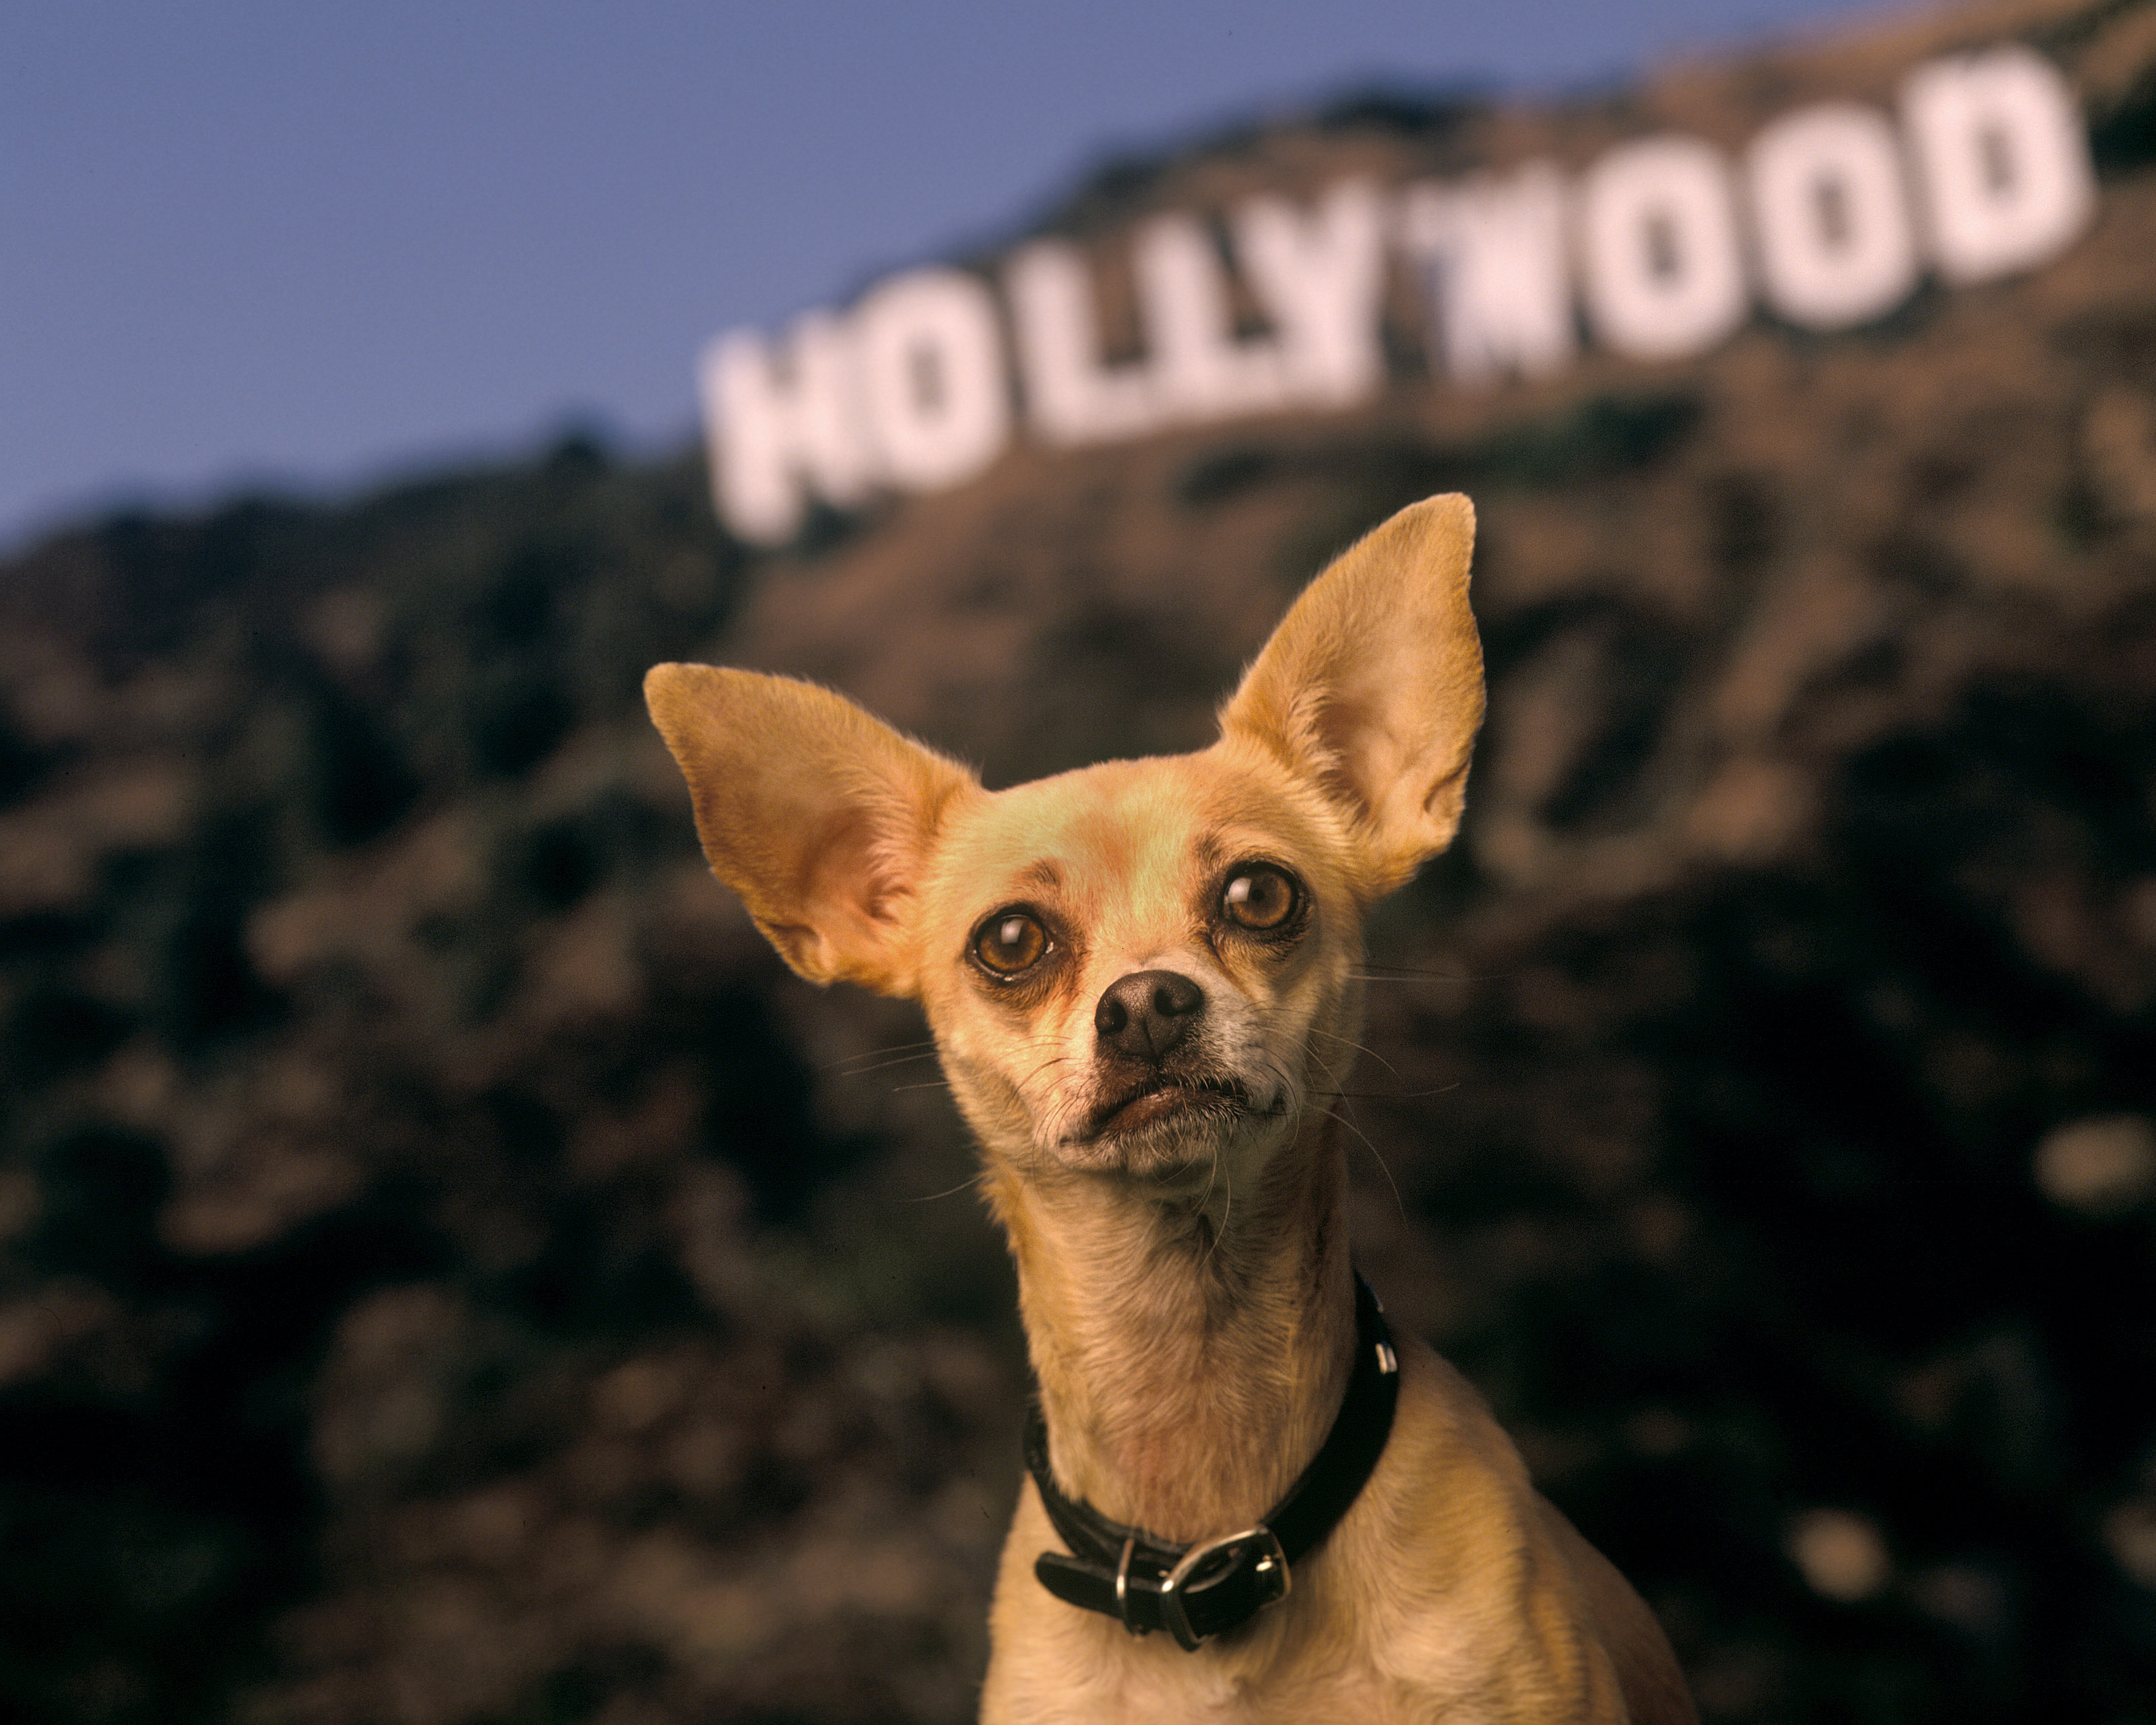 Gidget the Taco Bell dog.